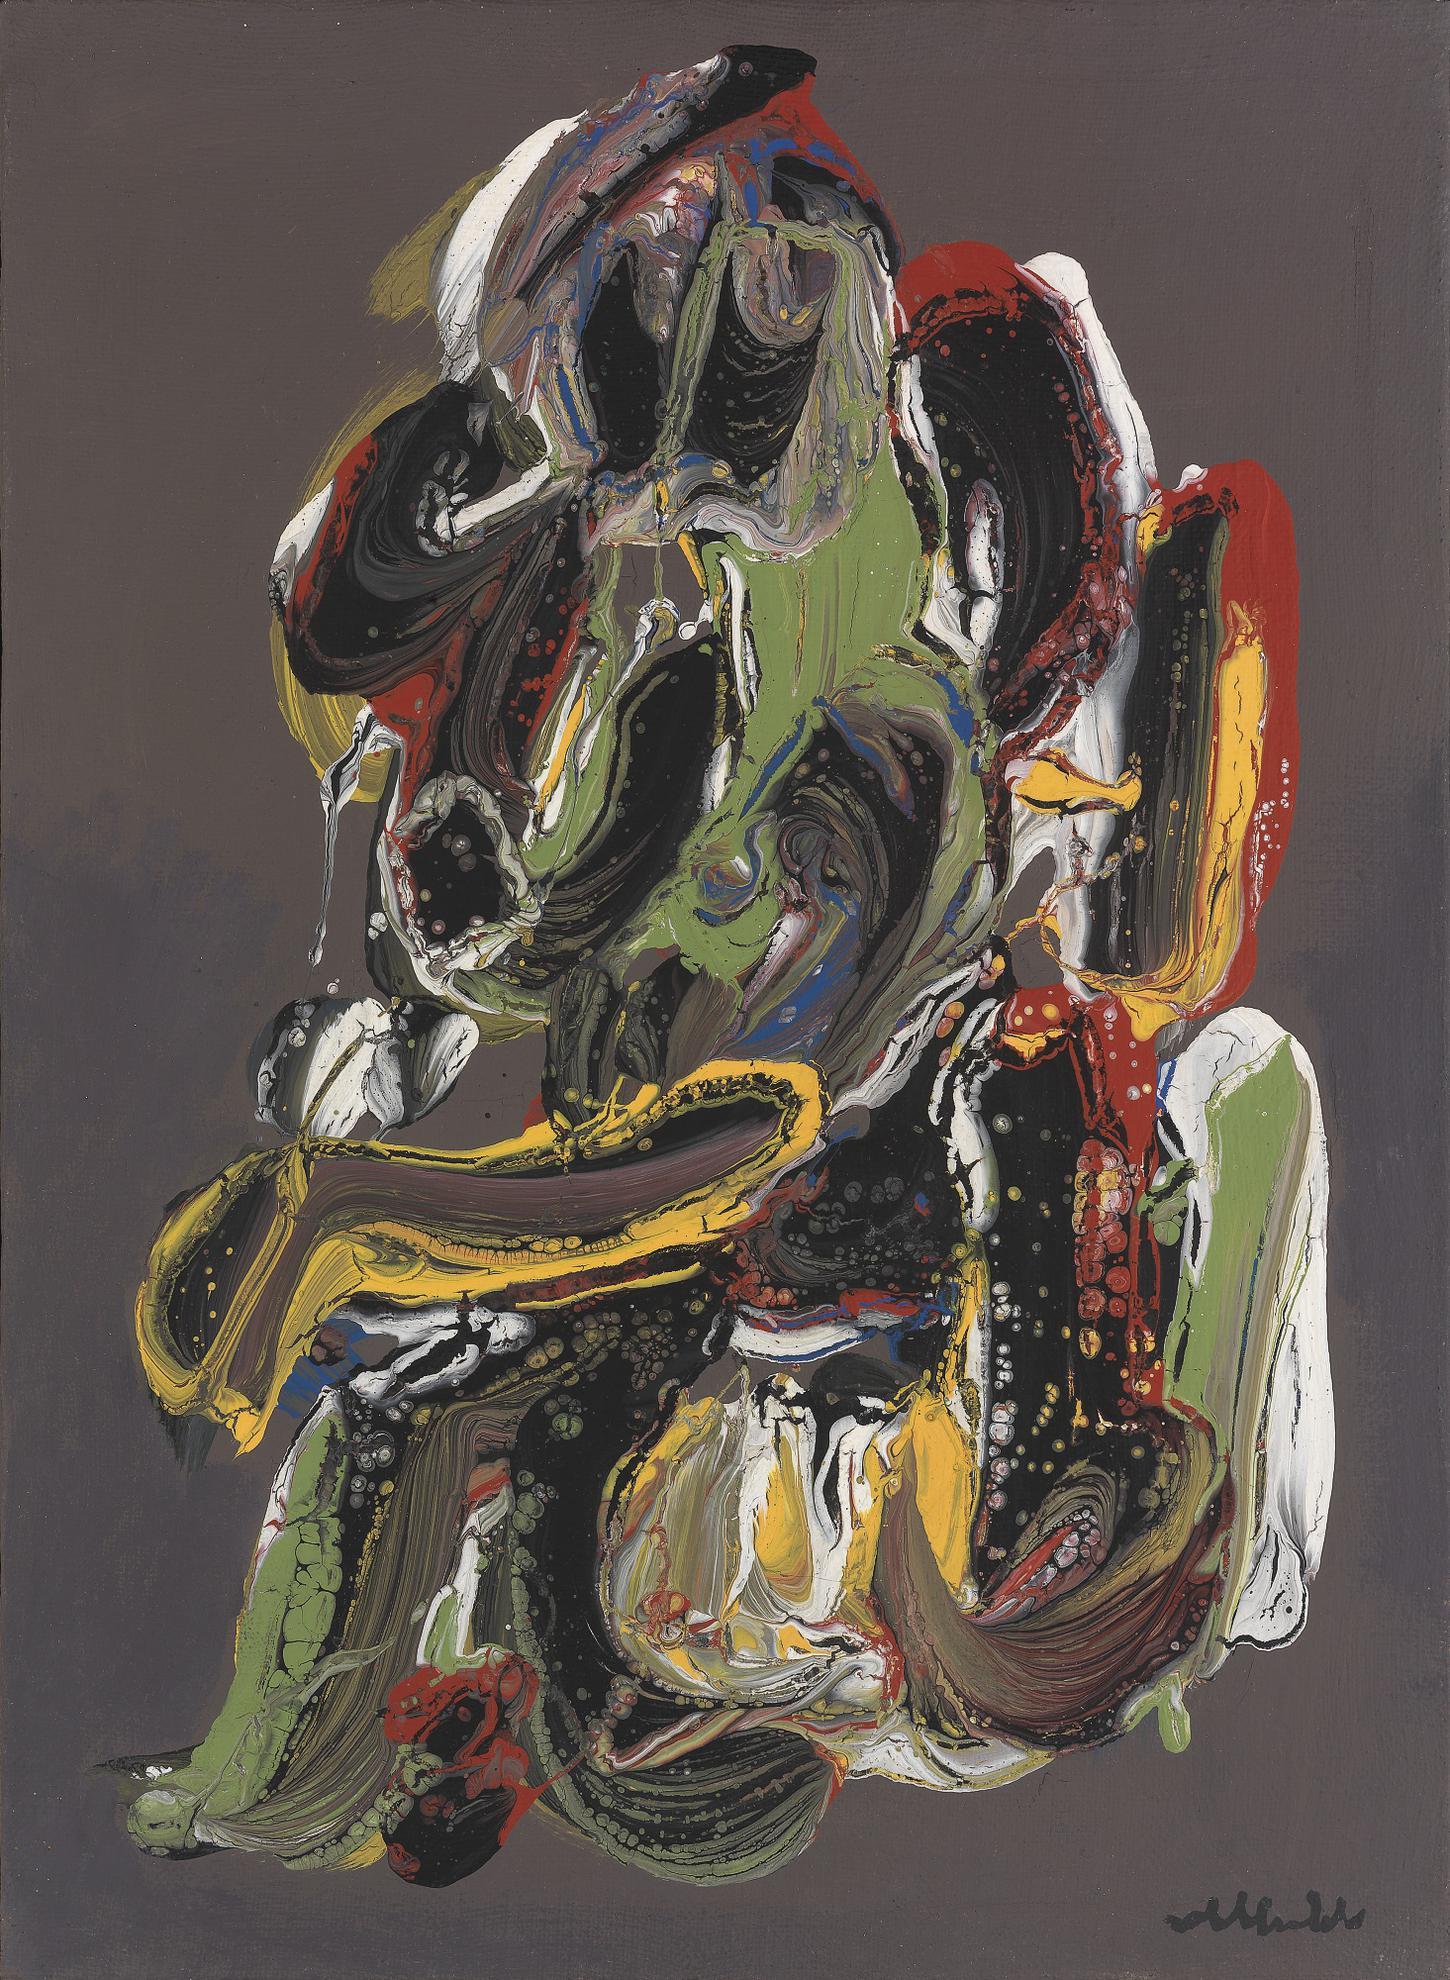 Hamed Abdalla - Talisman-1970